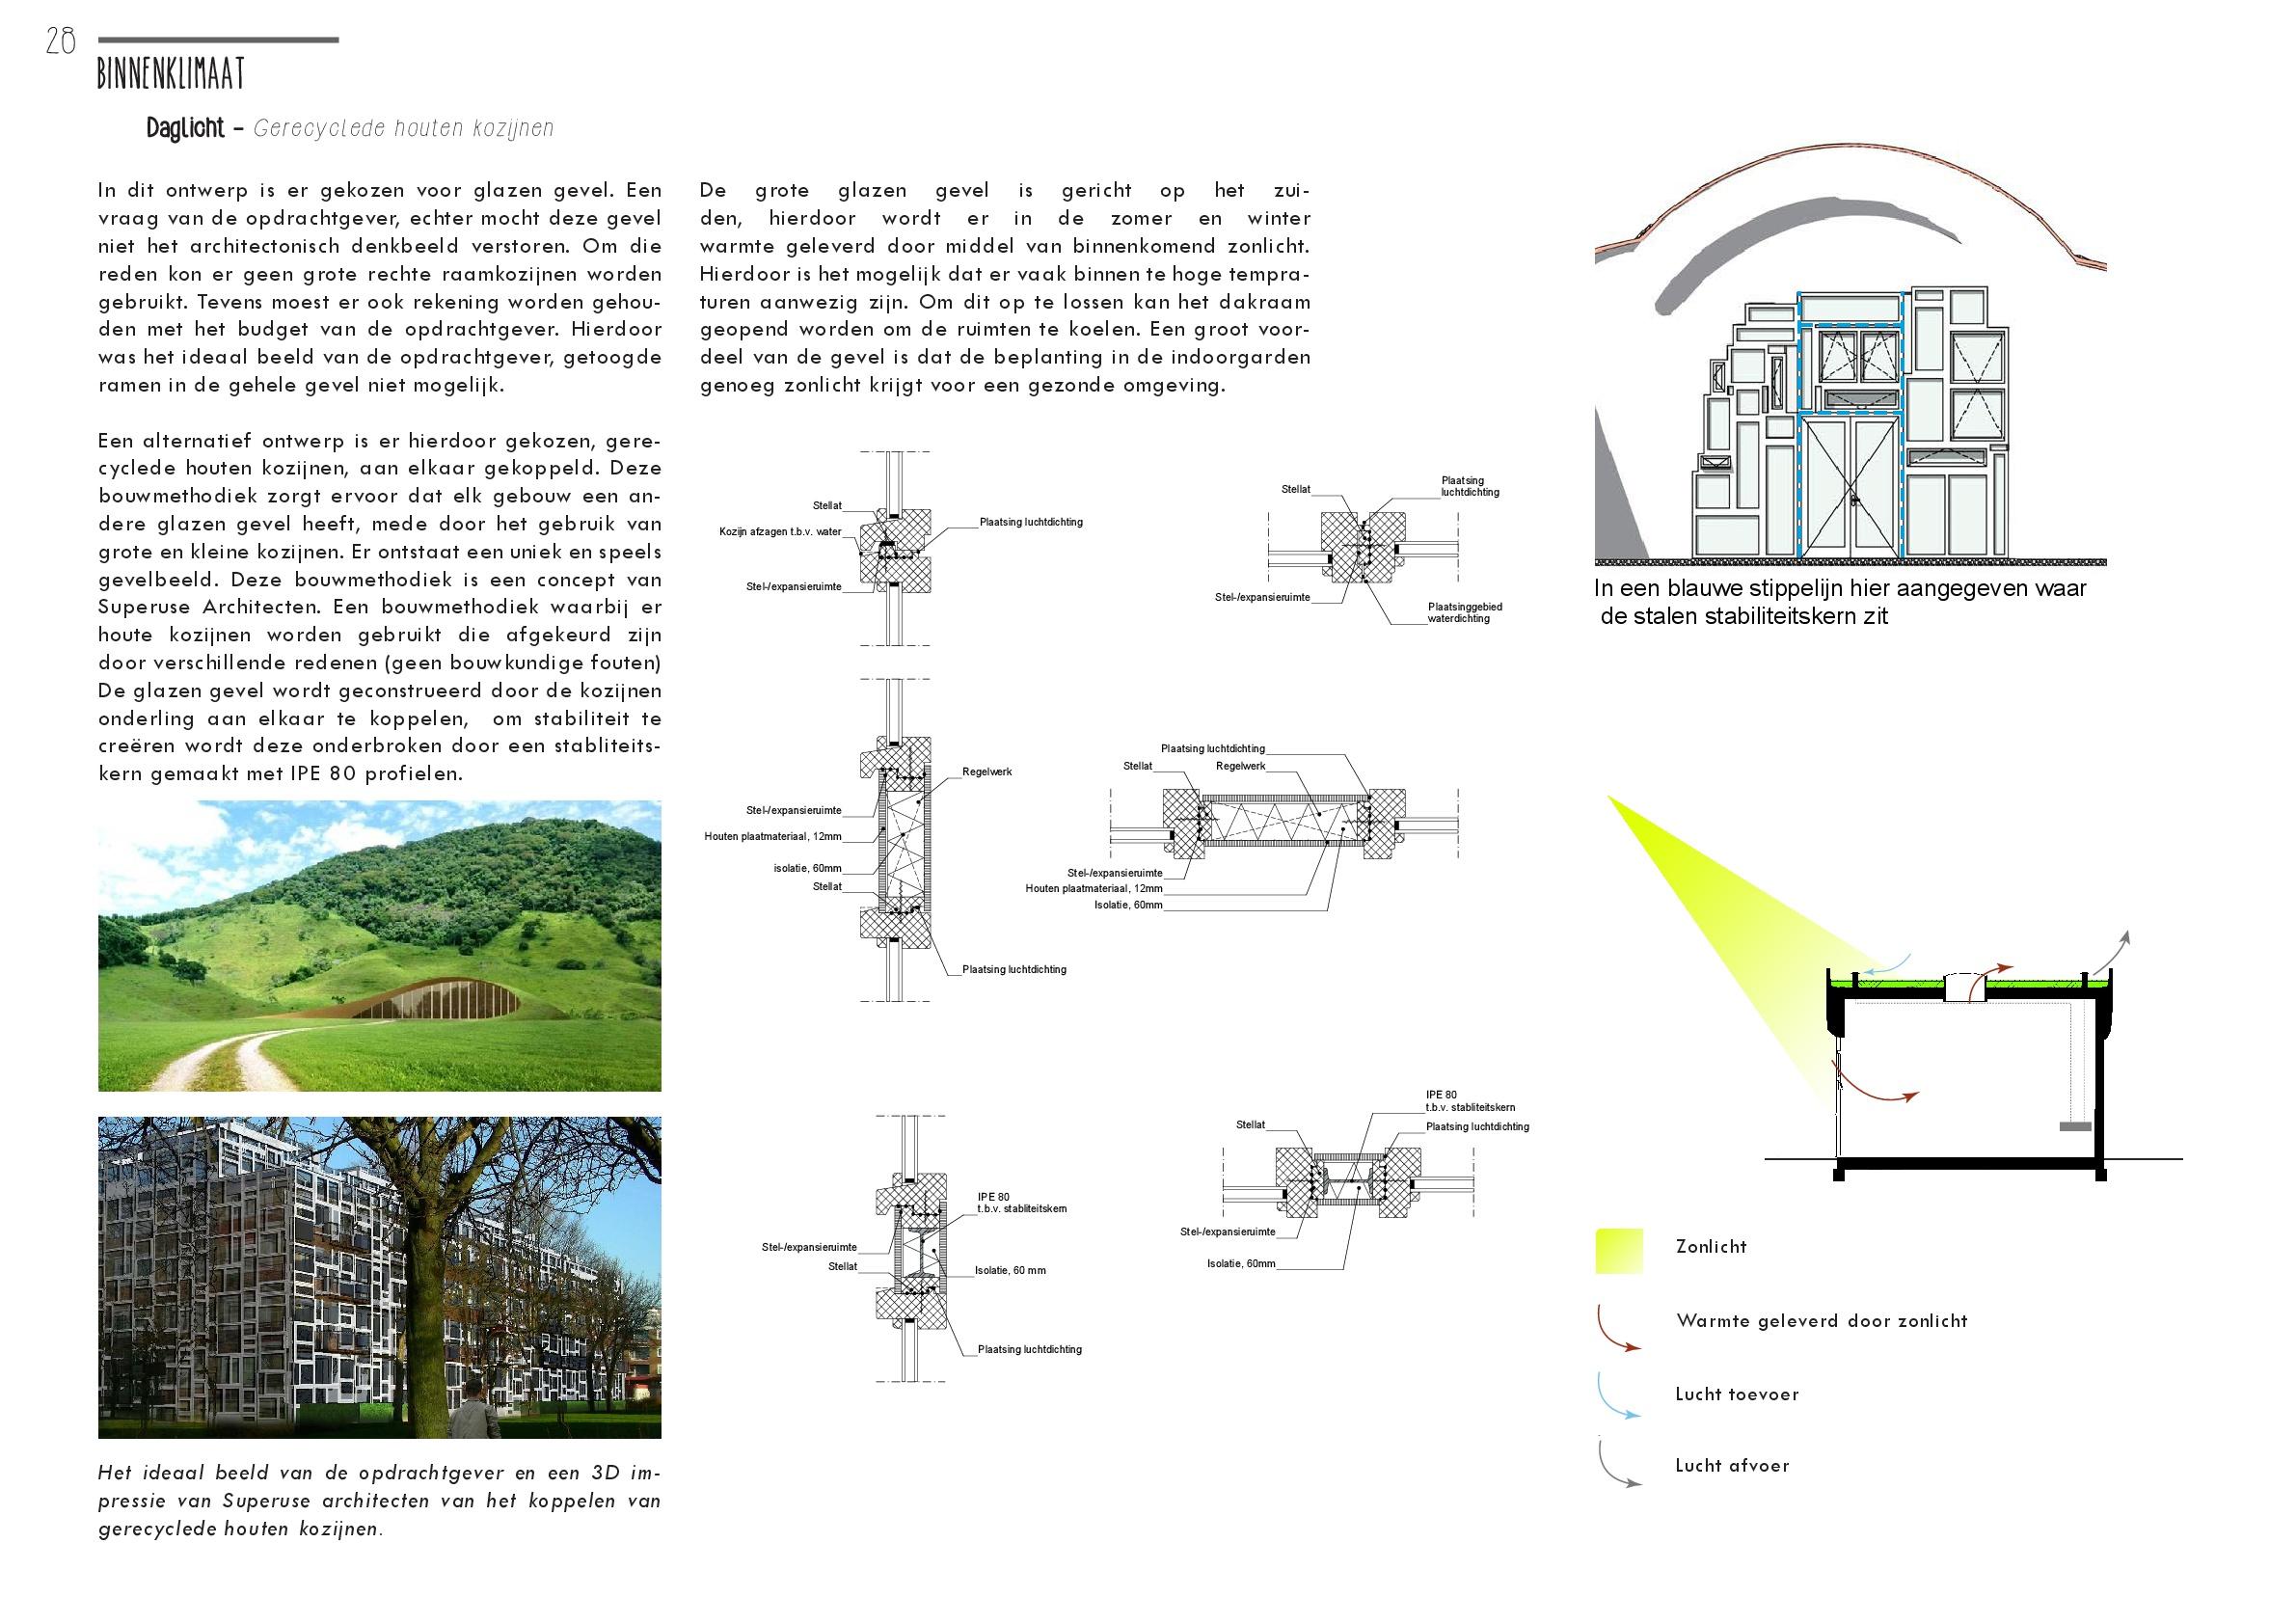 projectverslag-v2.8-inlever-028